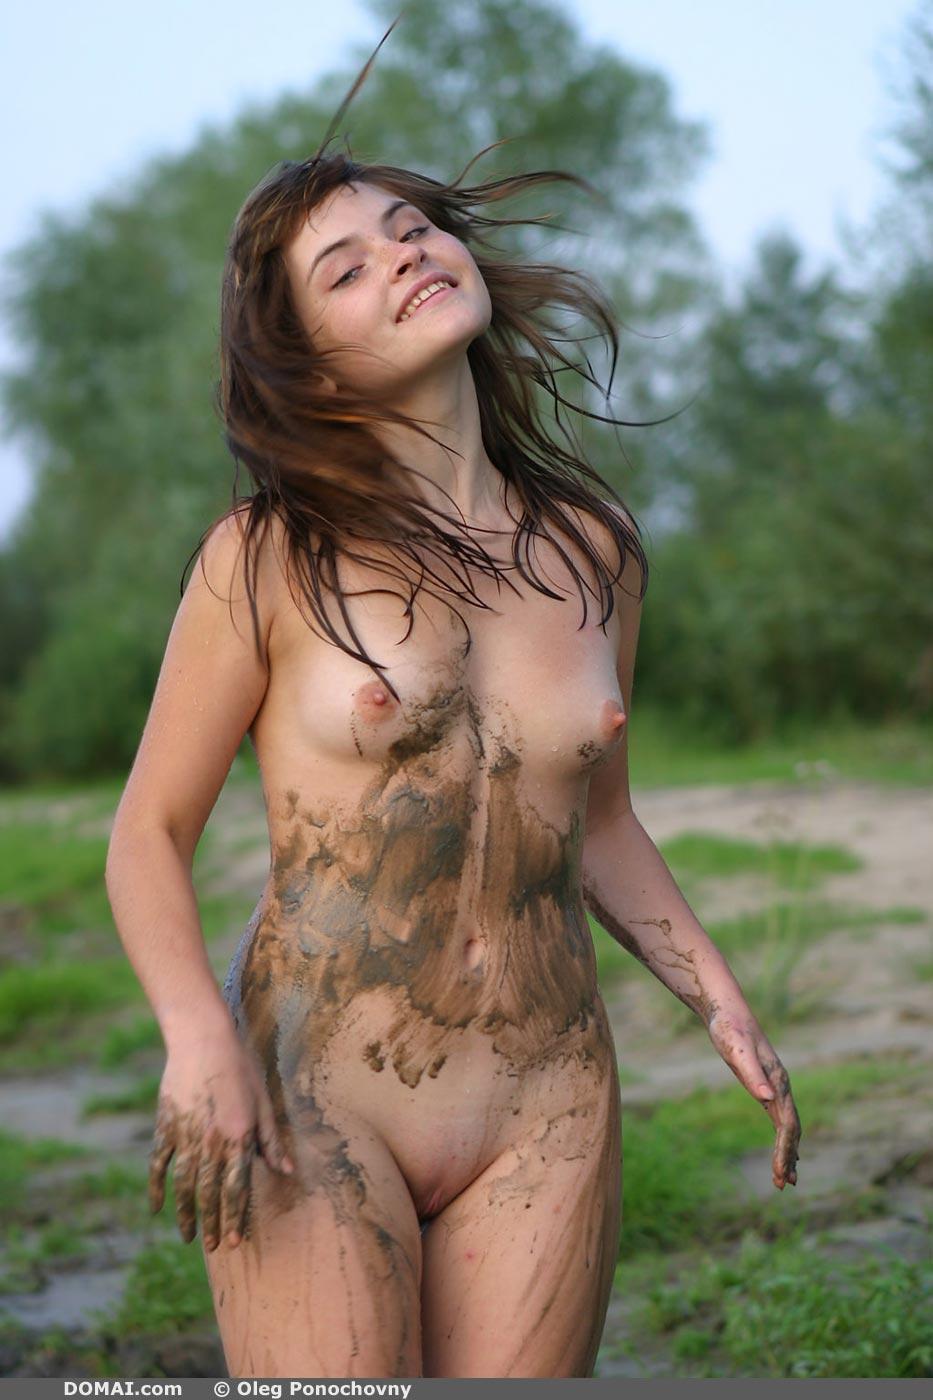 Ann from domai nude